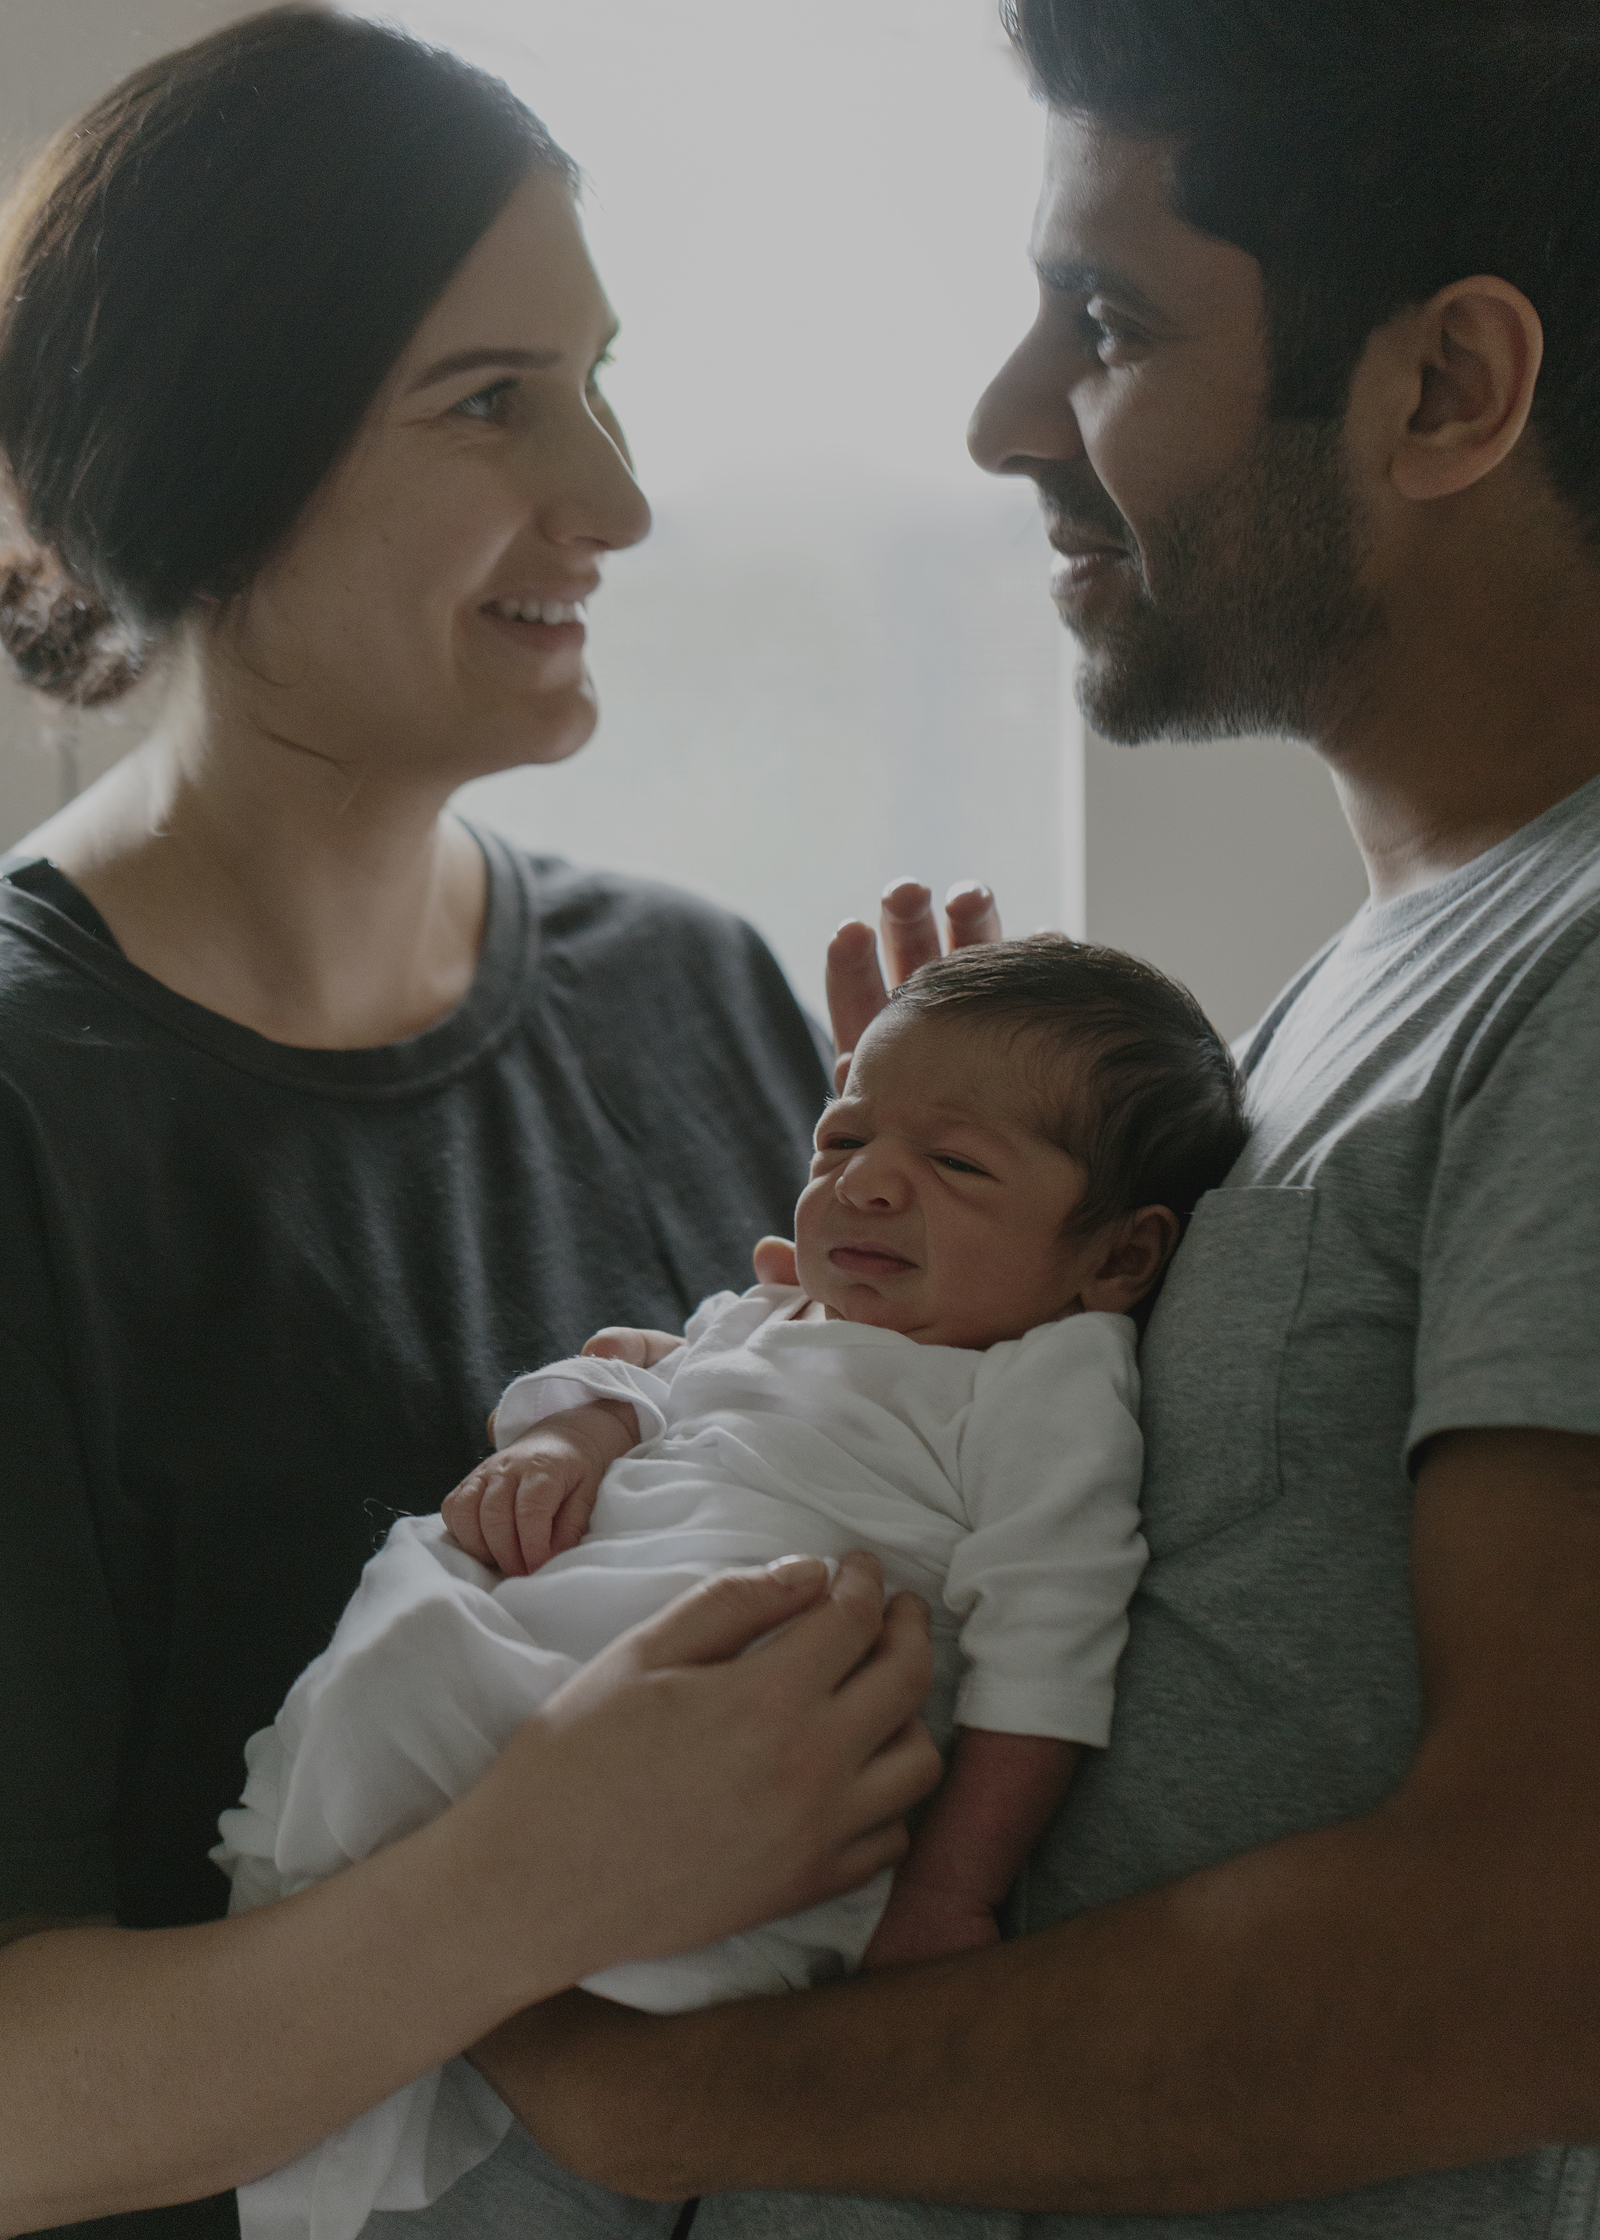 Natural Family Portrait Photography Melbourne